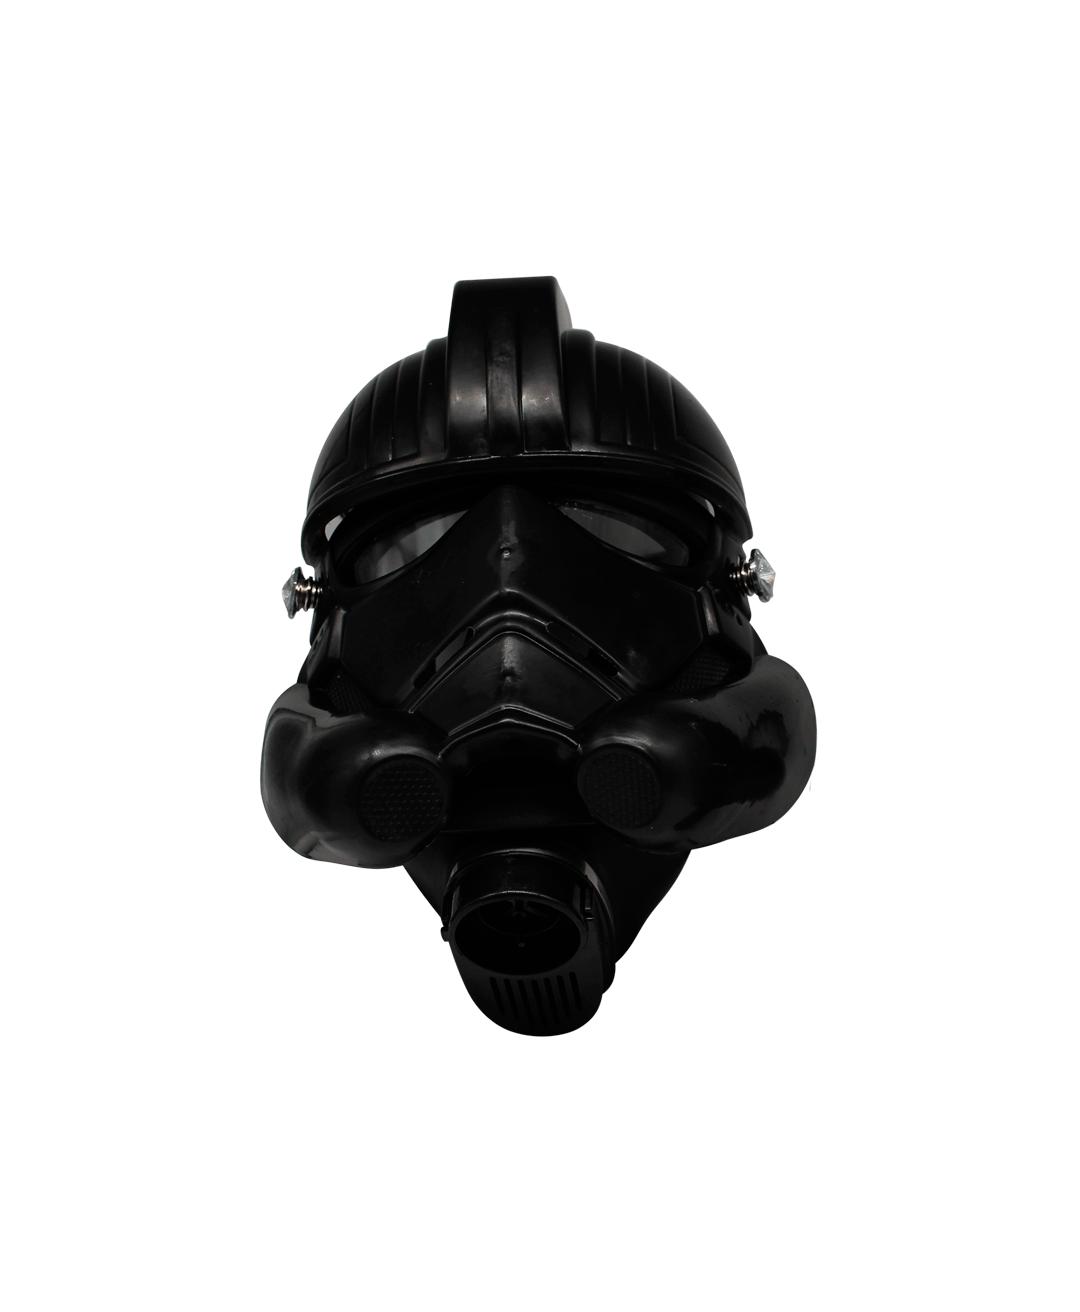 Bong Mascara Black StormTrooper